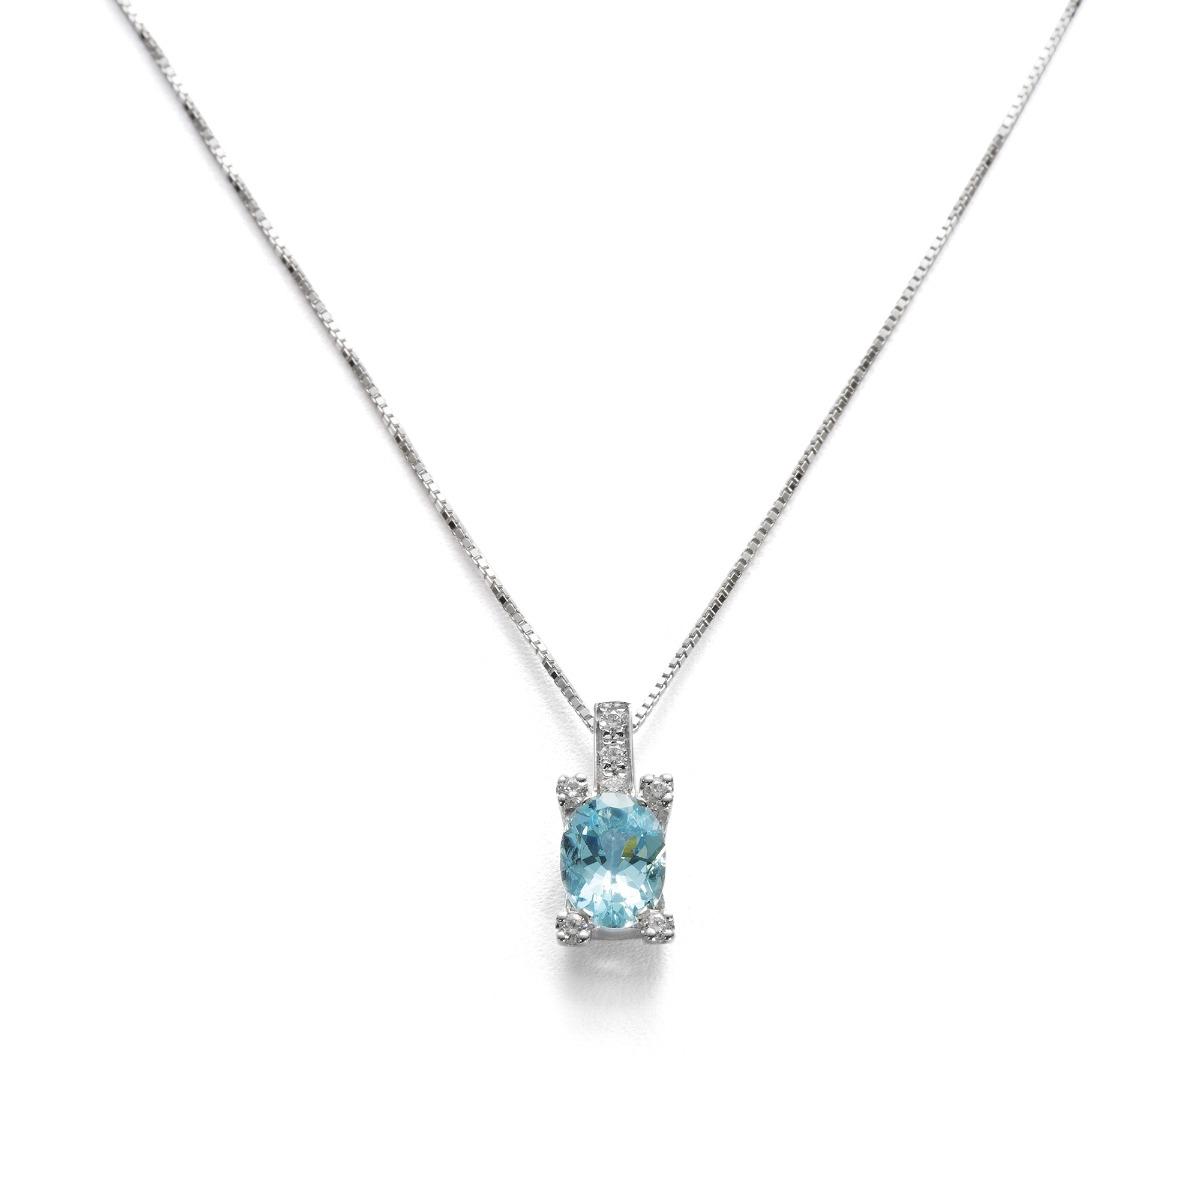 Oval-Cut Acquamarine Pendant with Diamonds